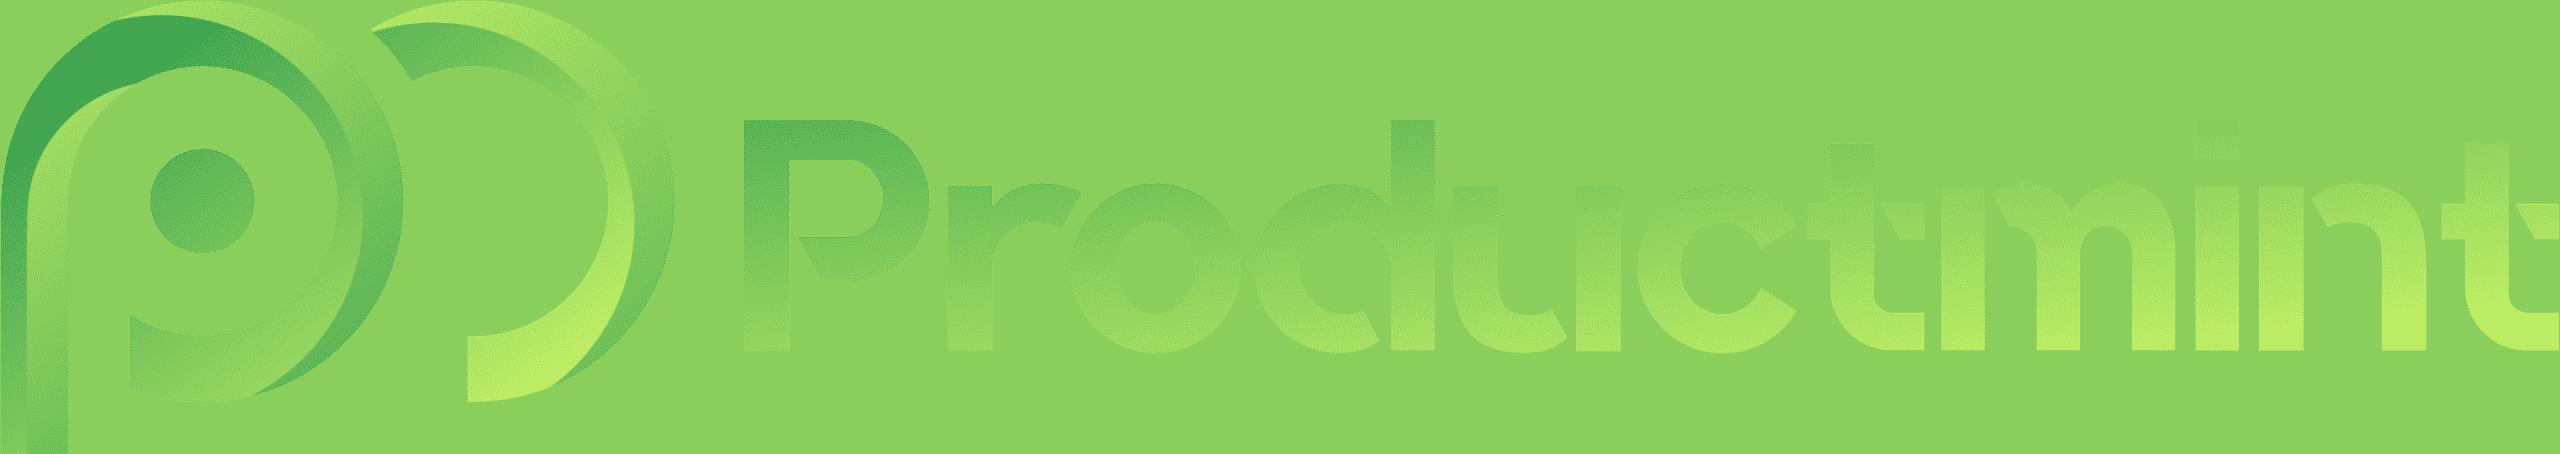 productmint